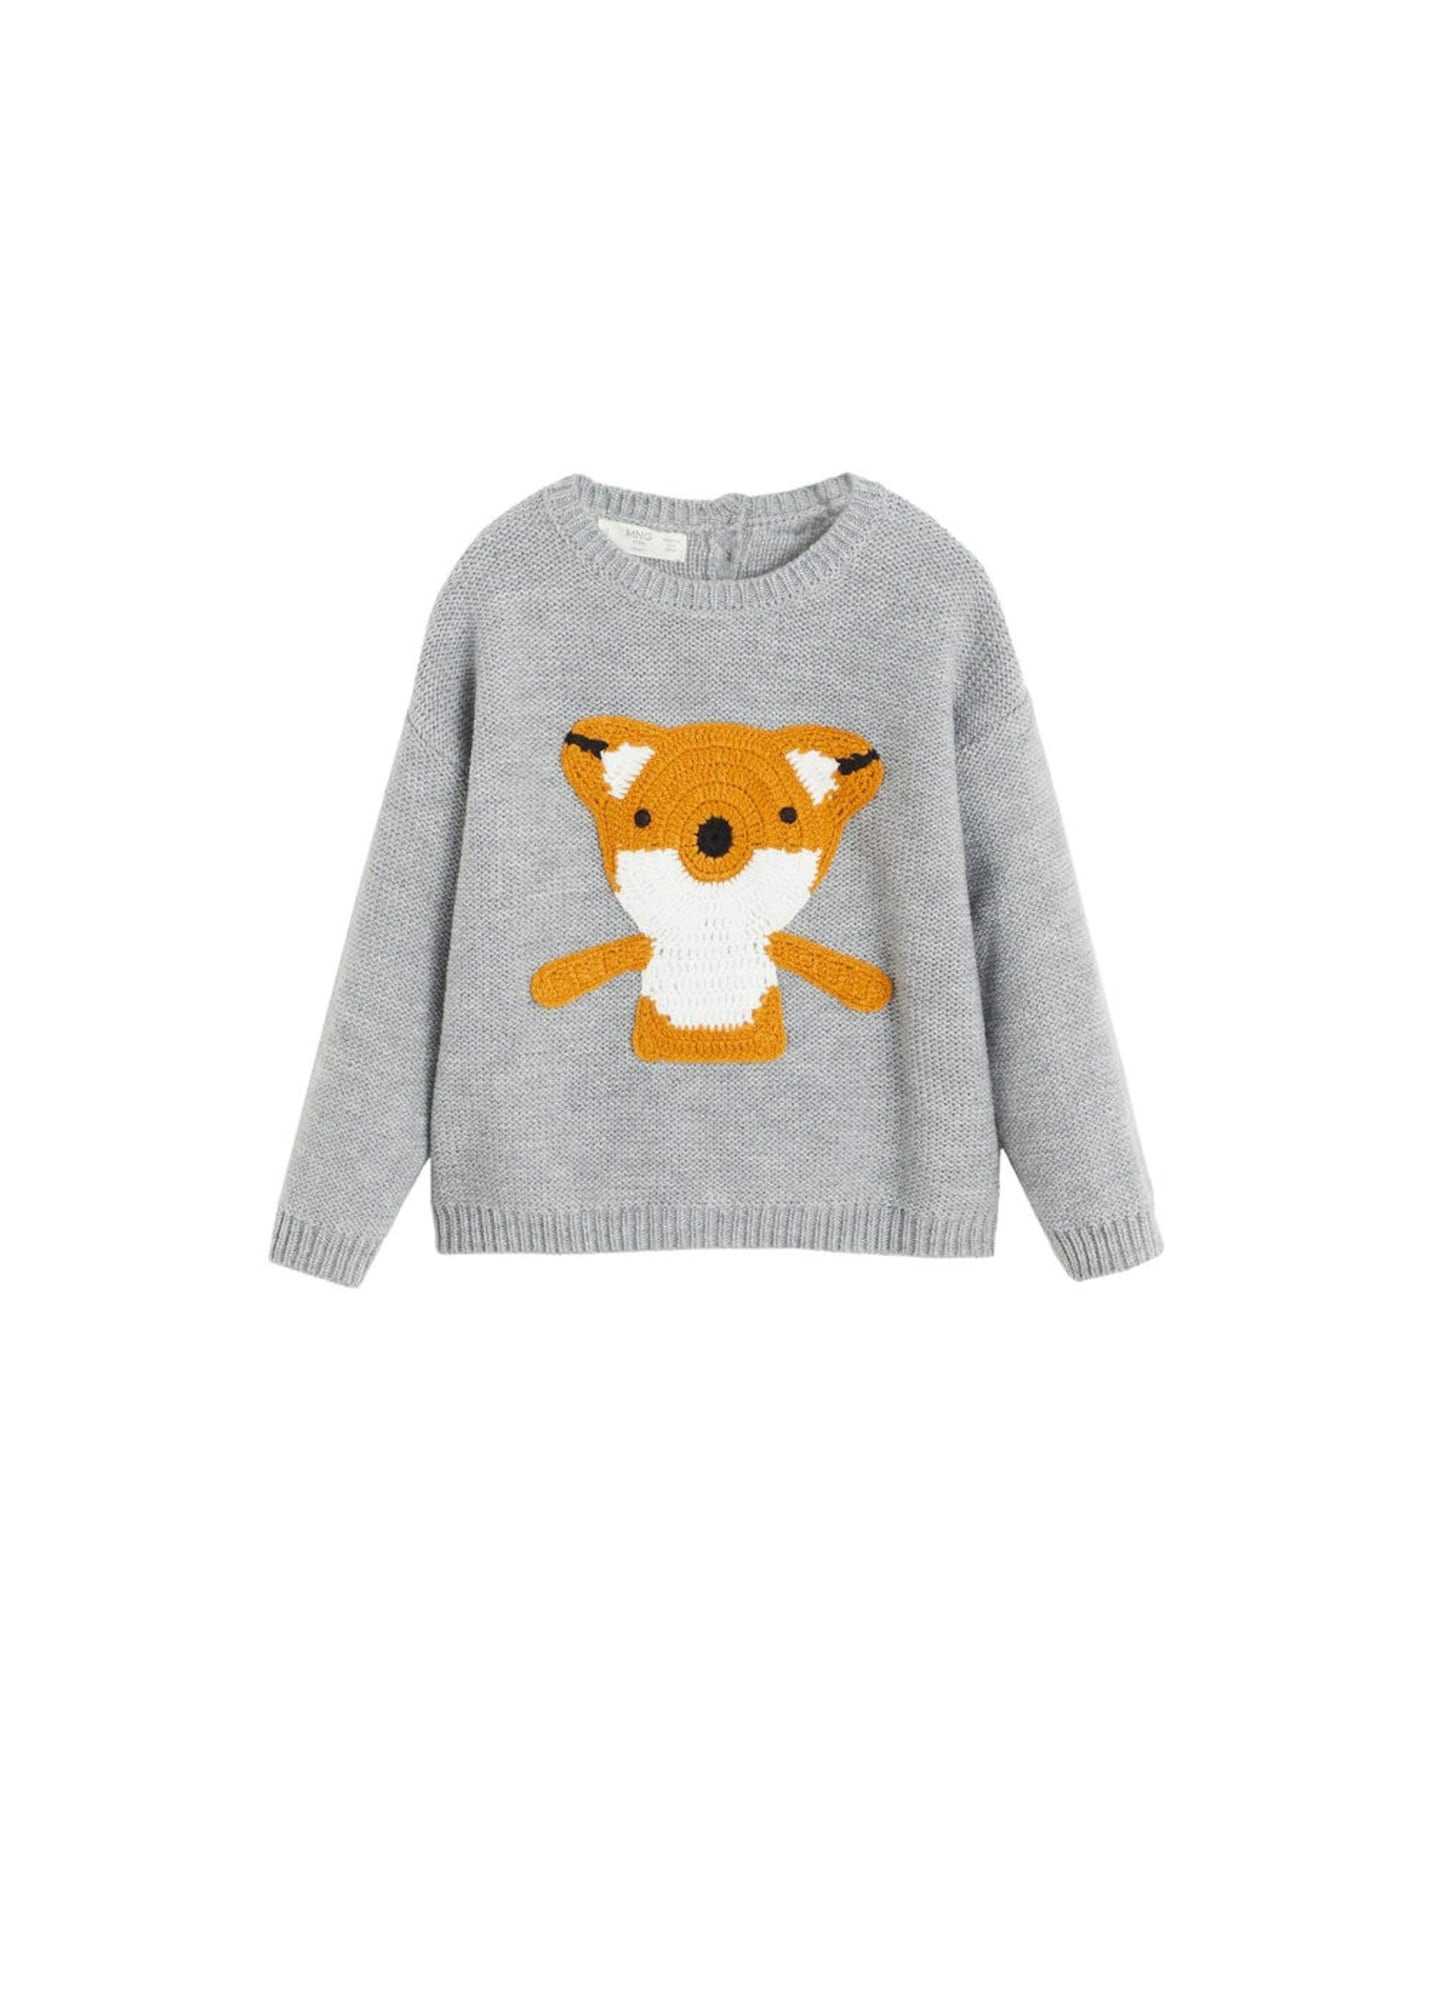 Miniboyoberteile - Pullover 'Foxy' - Onlineshop ABOUT YOU